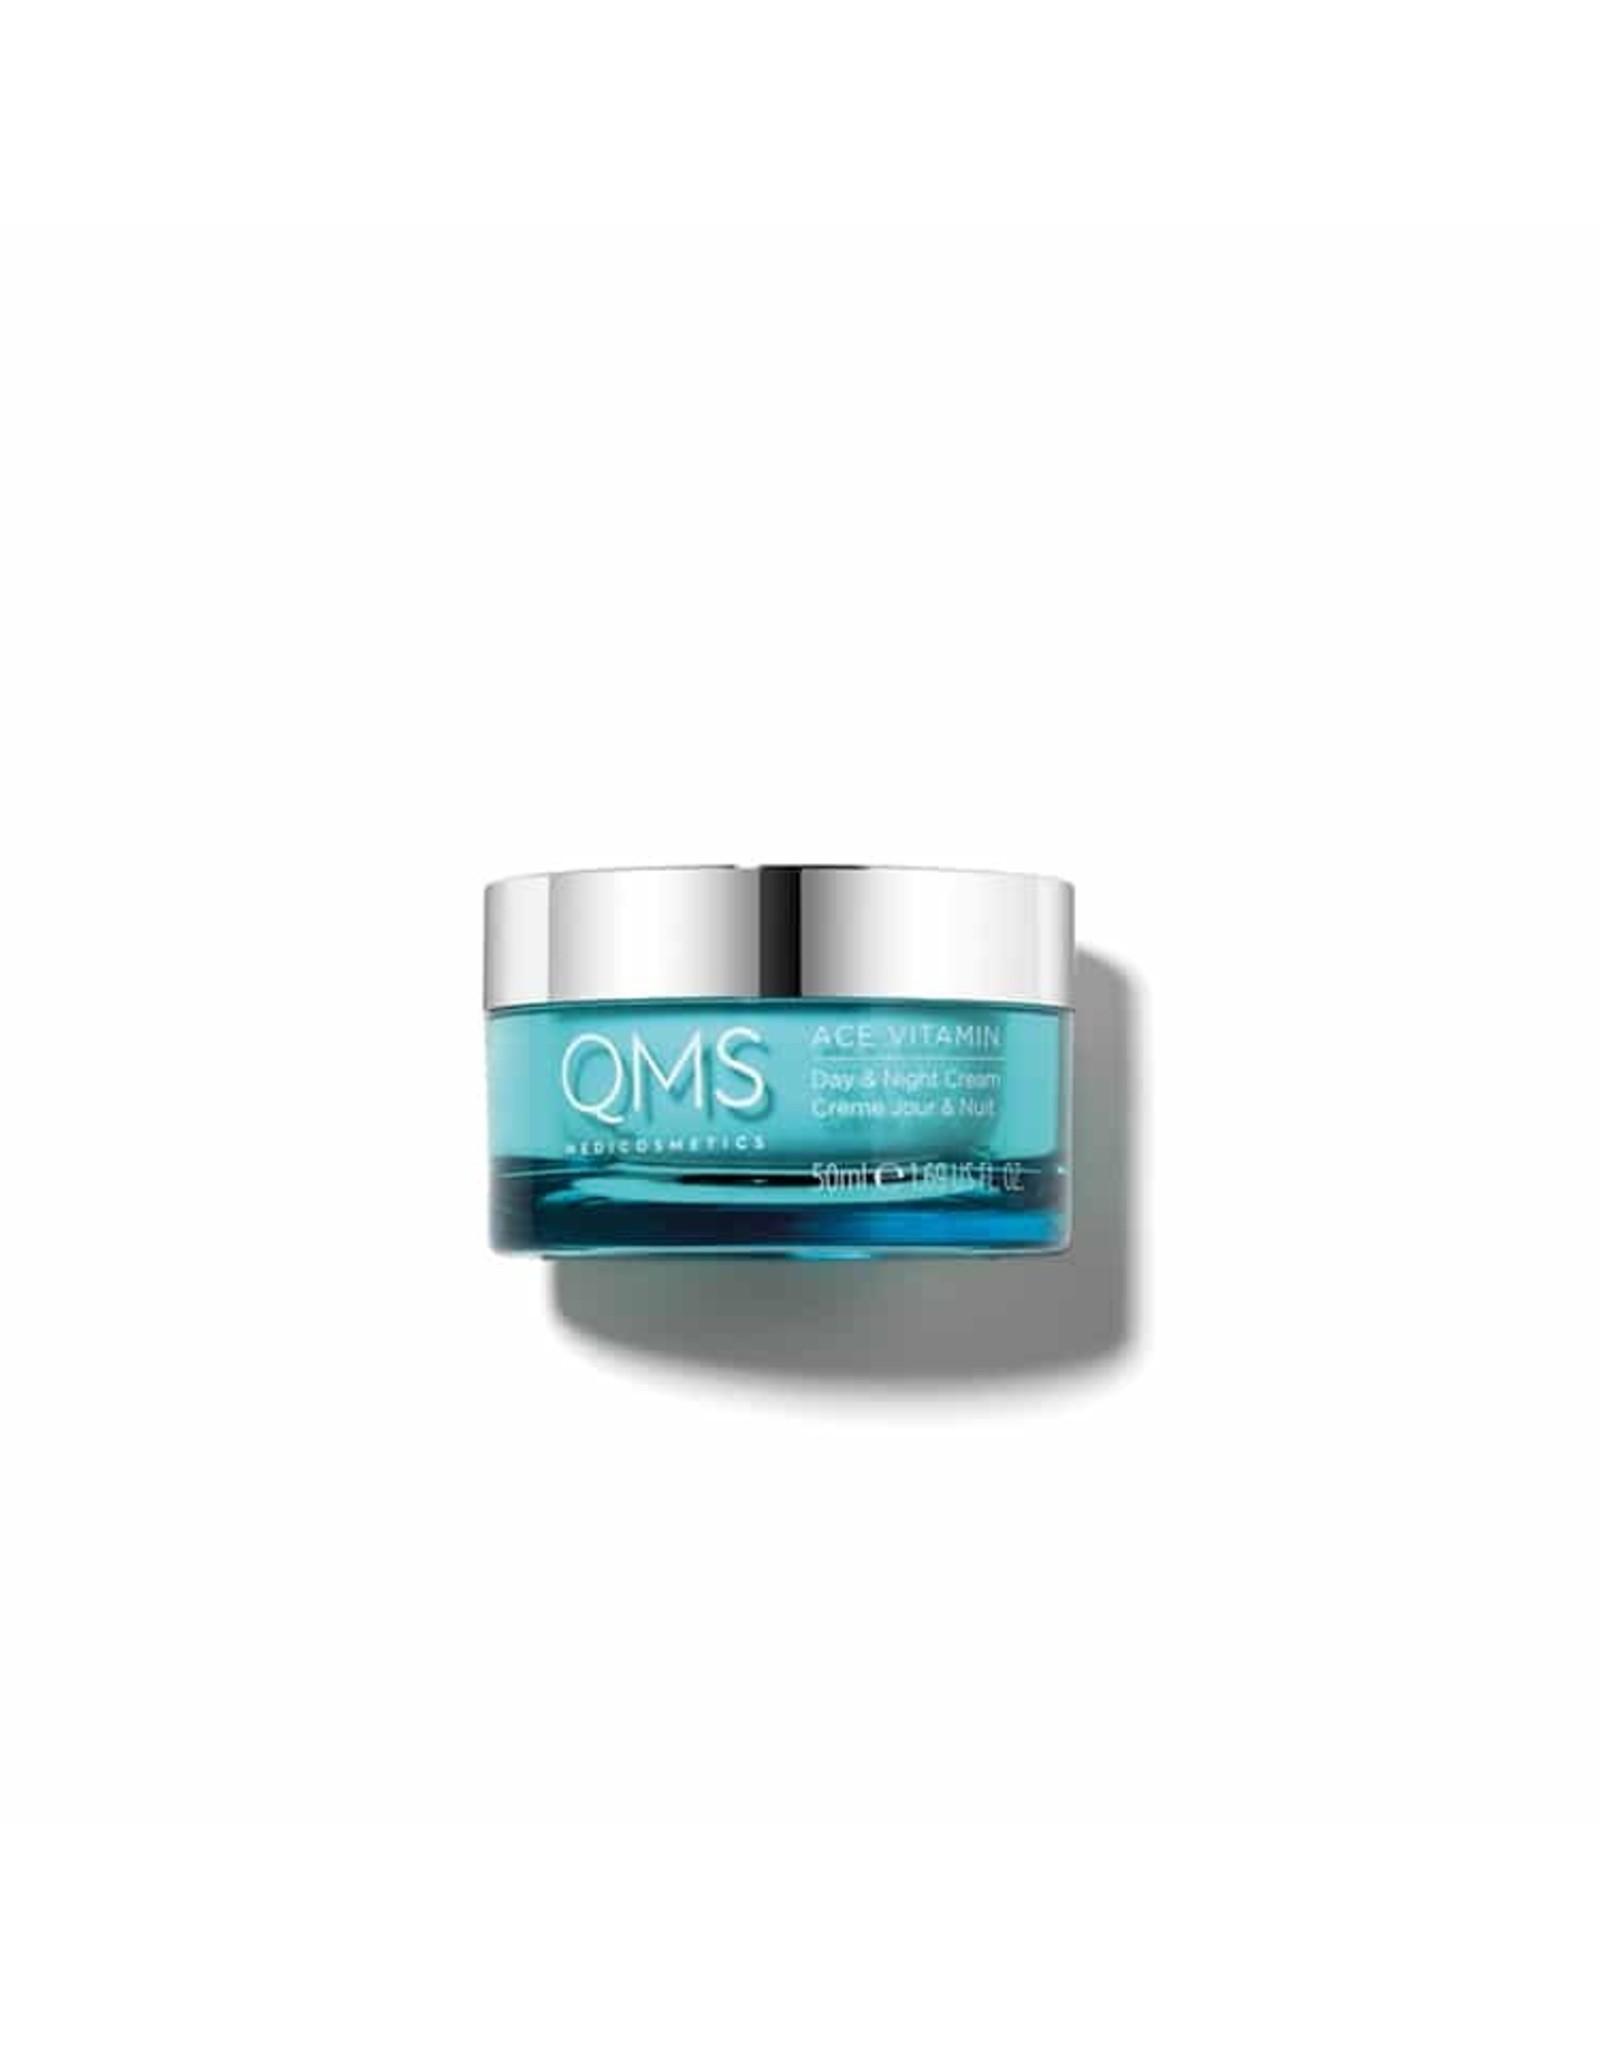 QMS Medicosmetics Ace Vitamin